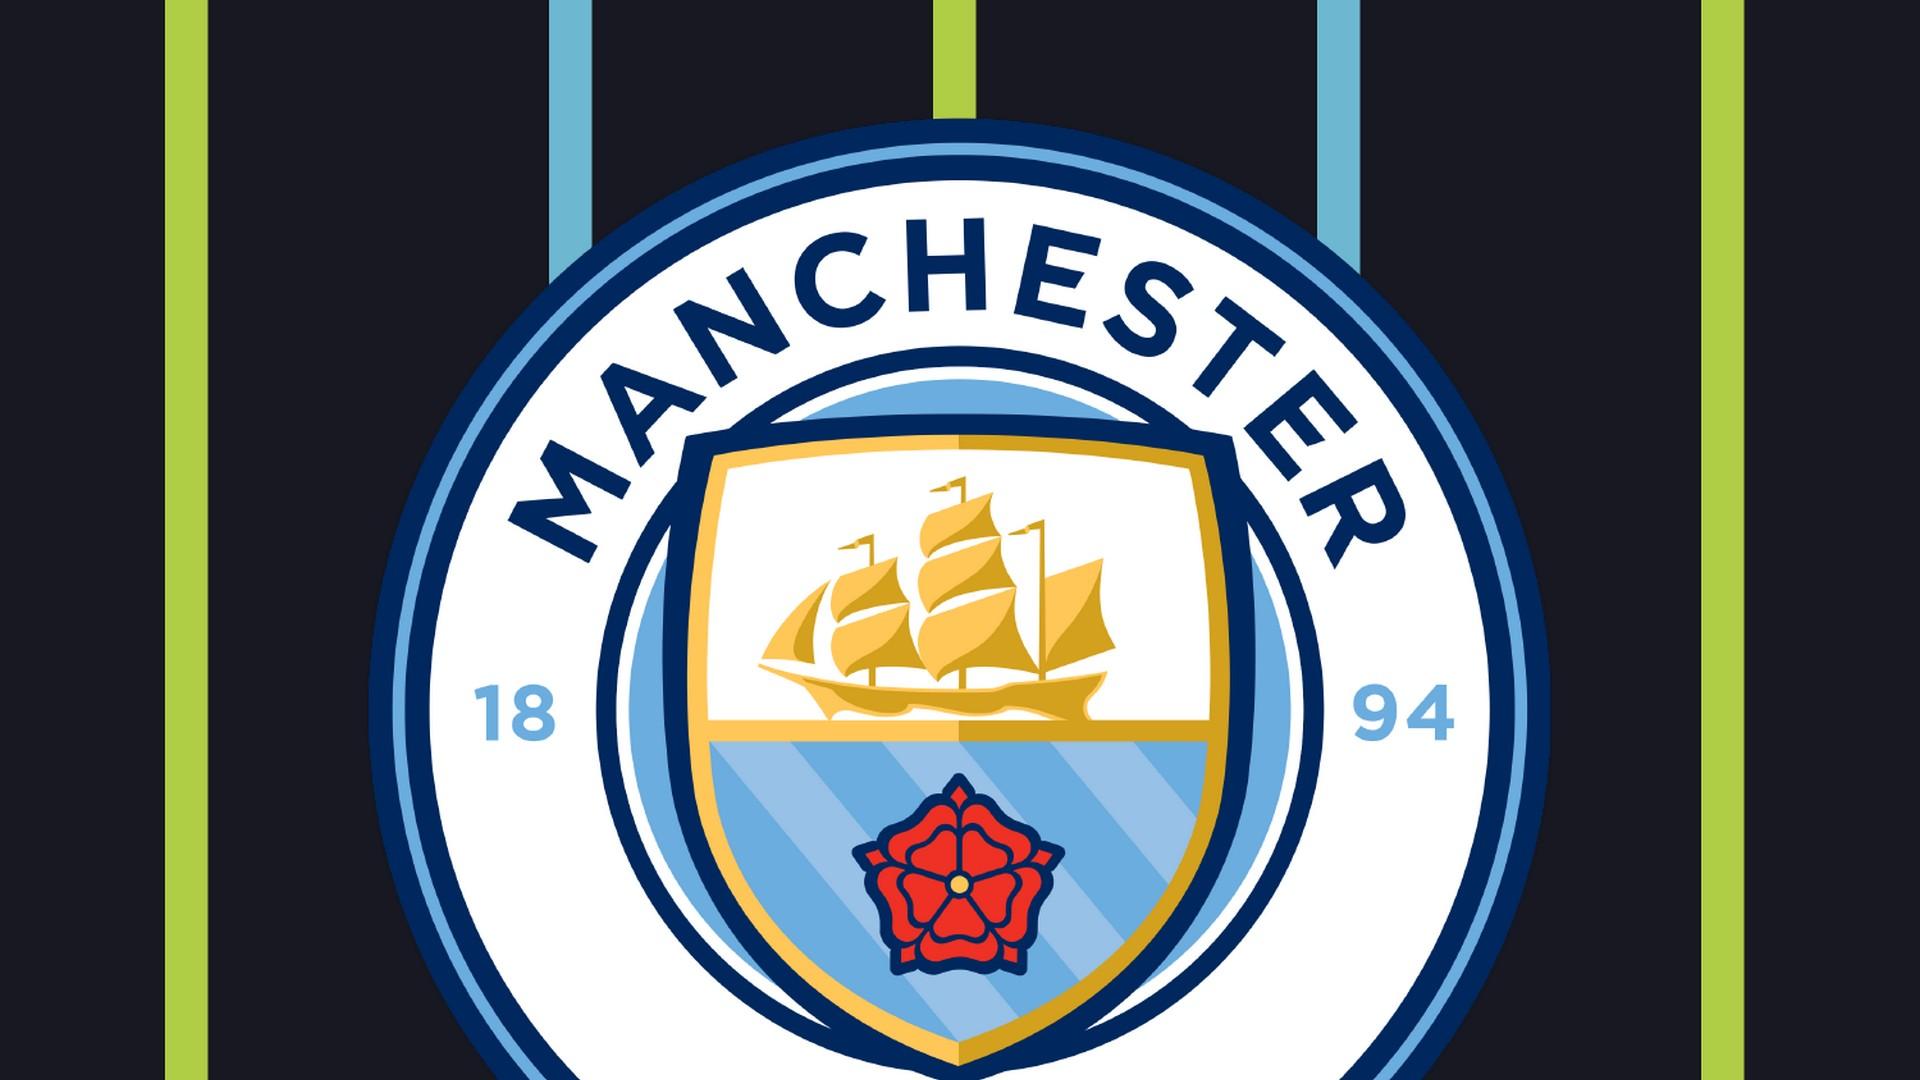 Man City Wallpaper 4K / 98 Manchester City F C Hd ...